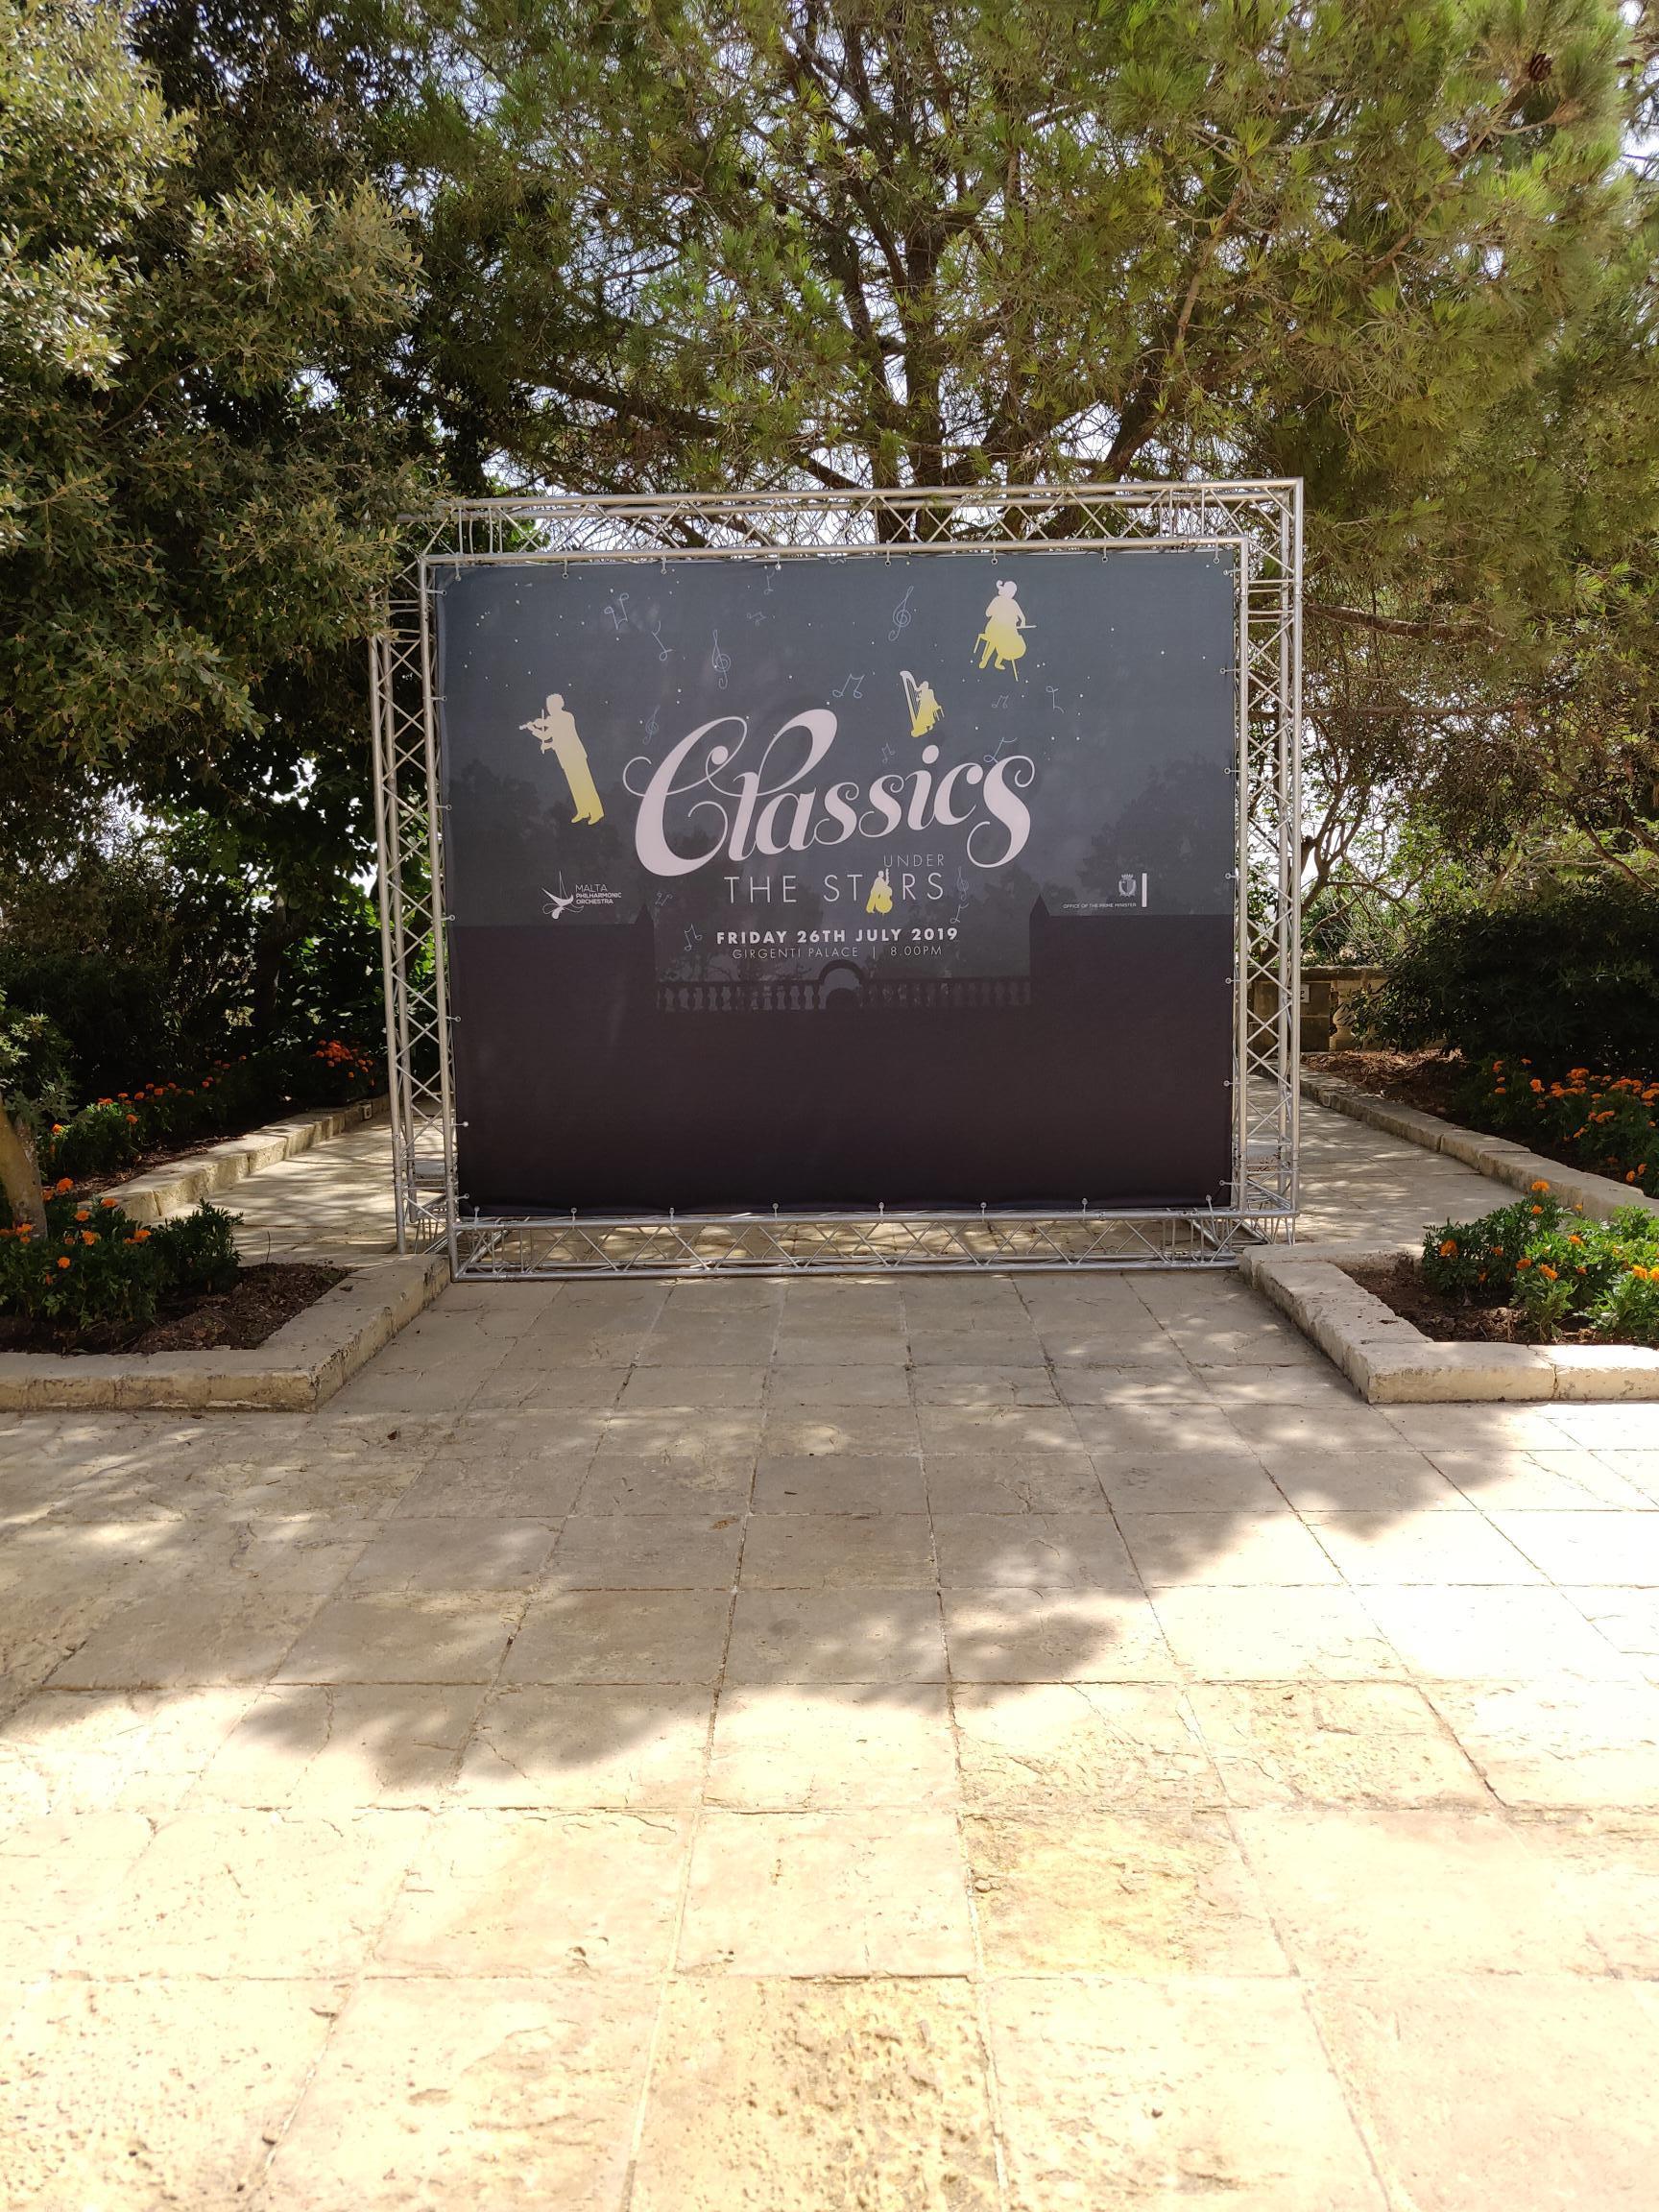 Classics under the Stars